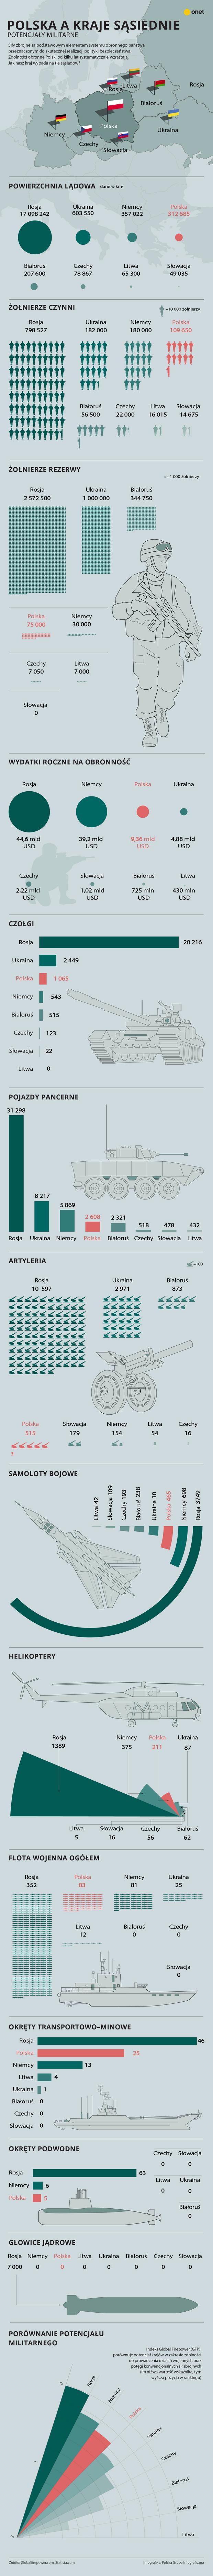 Potencjały militarne